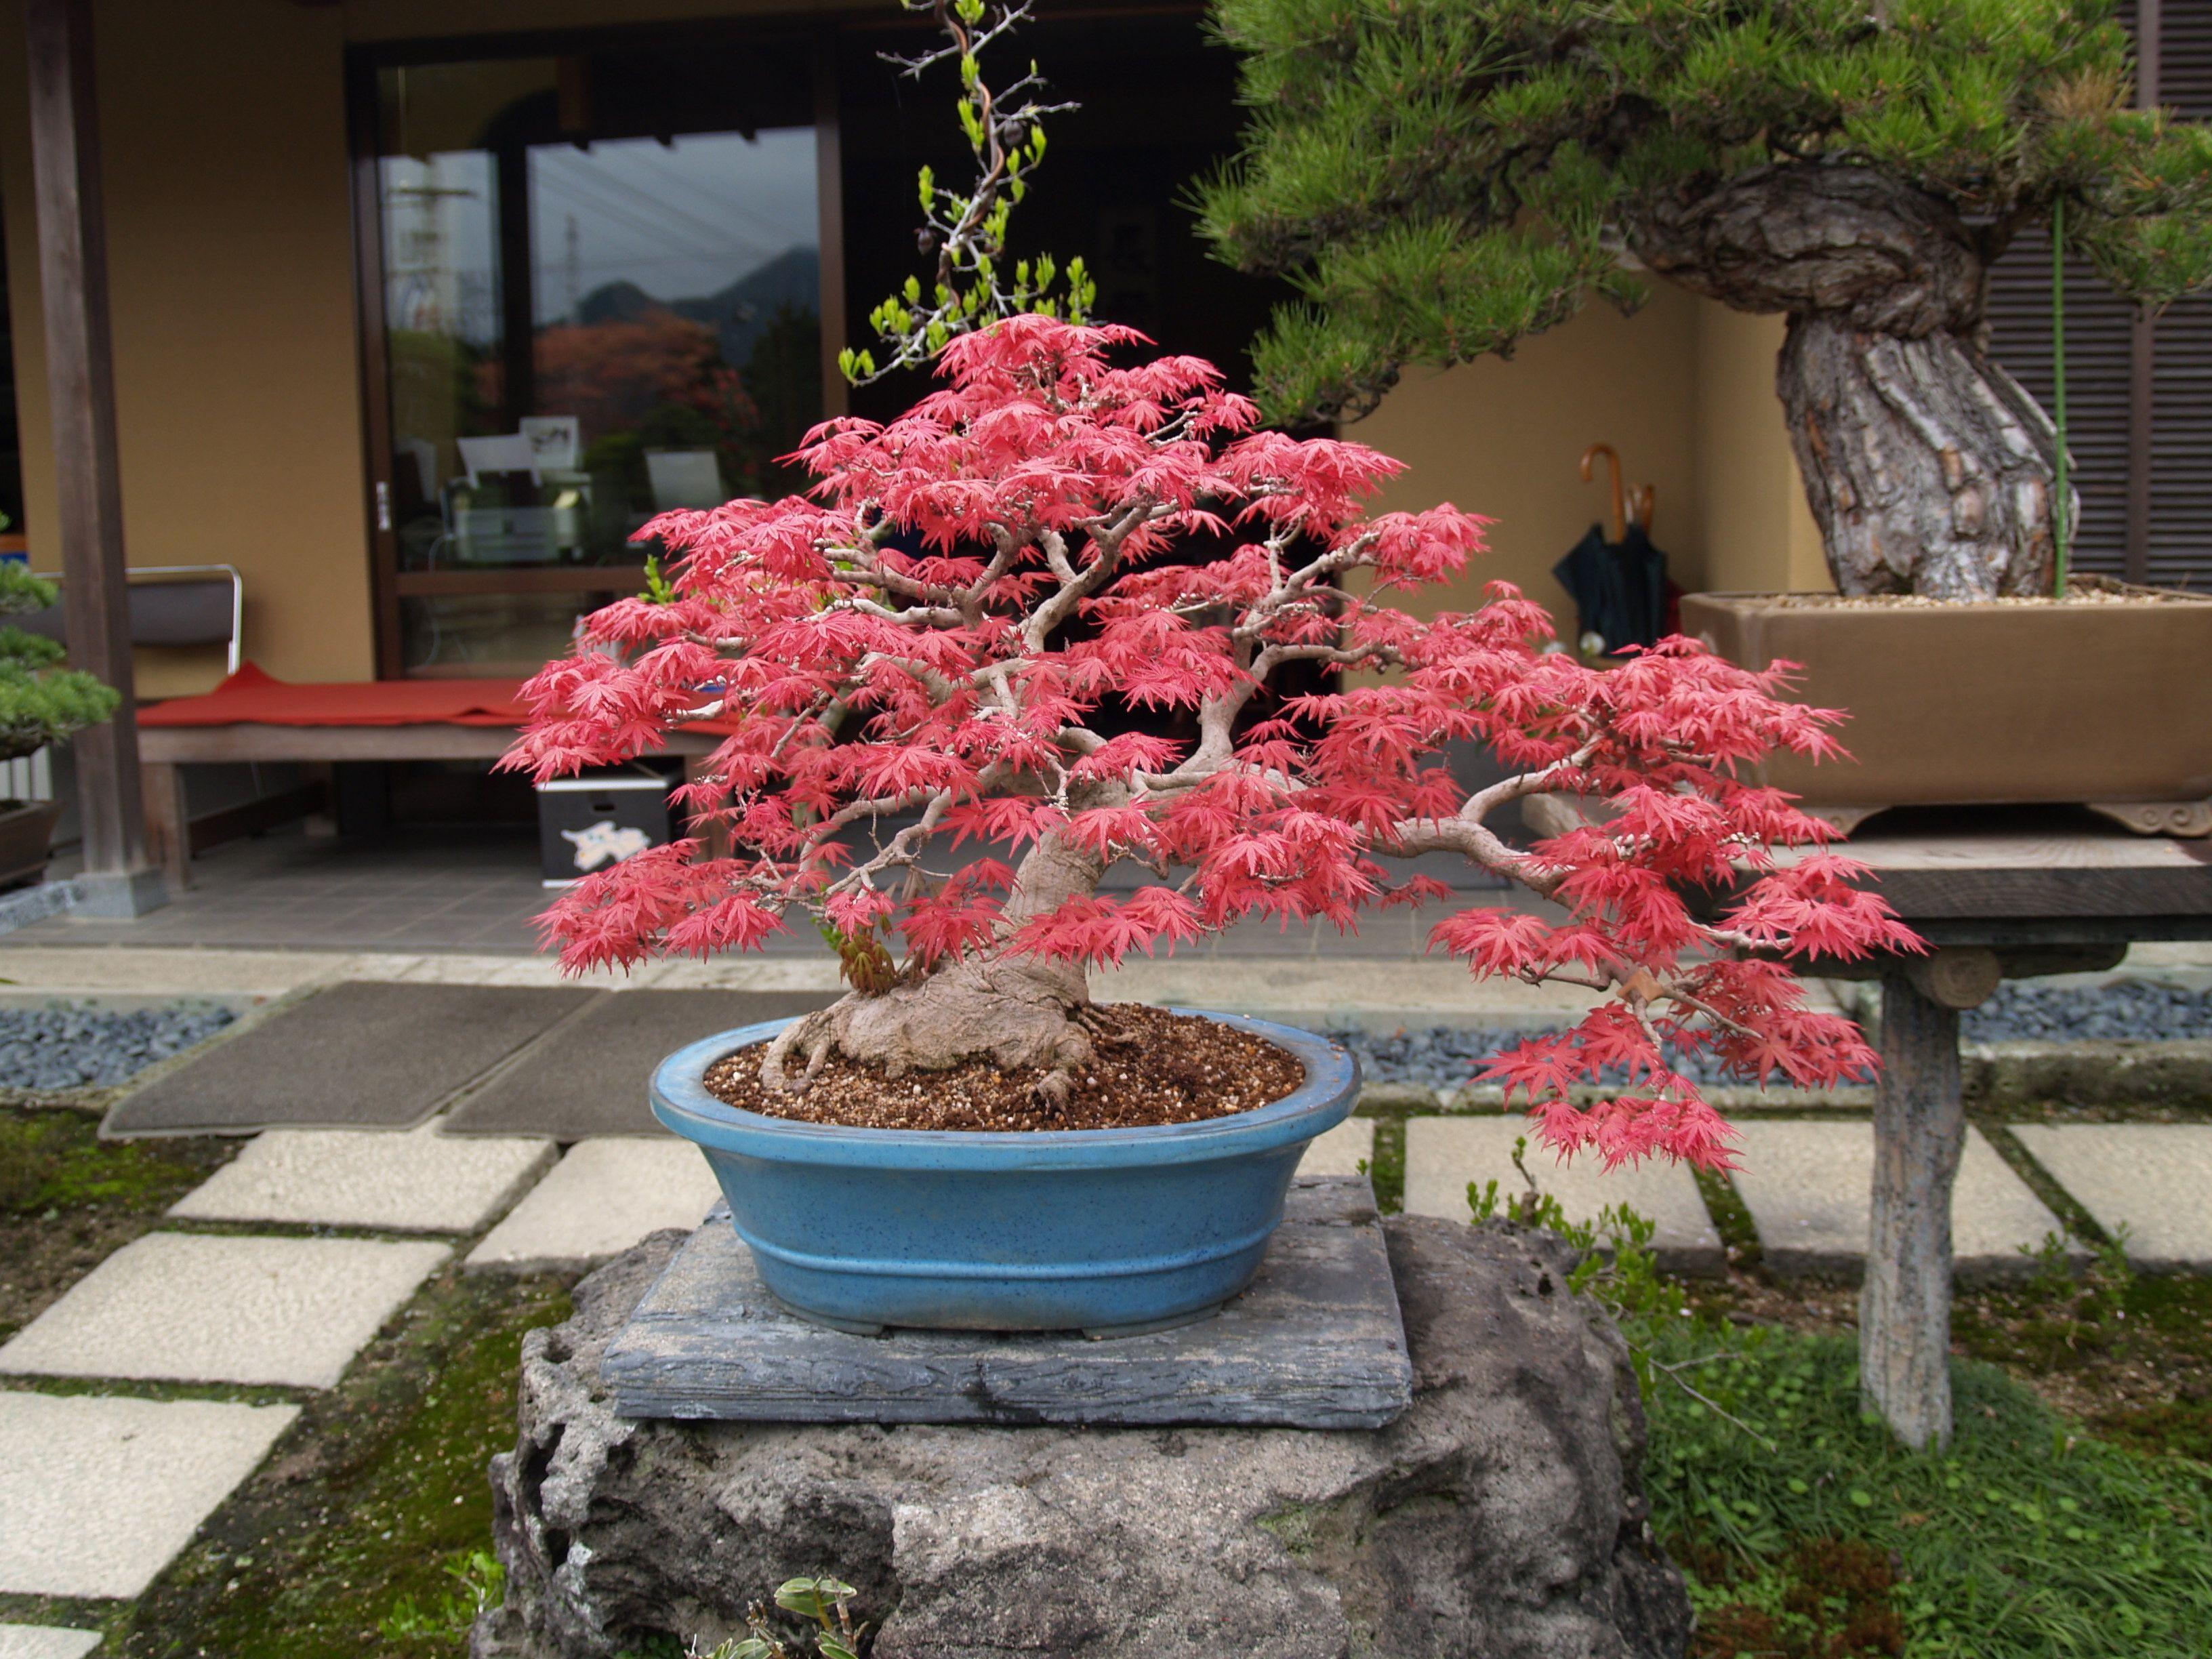 Check The Size Of The Nebari Bonsai Tree Bonsai Garden Fairy Garden Plants